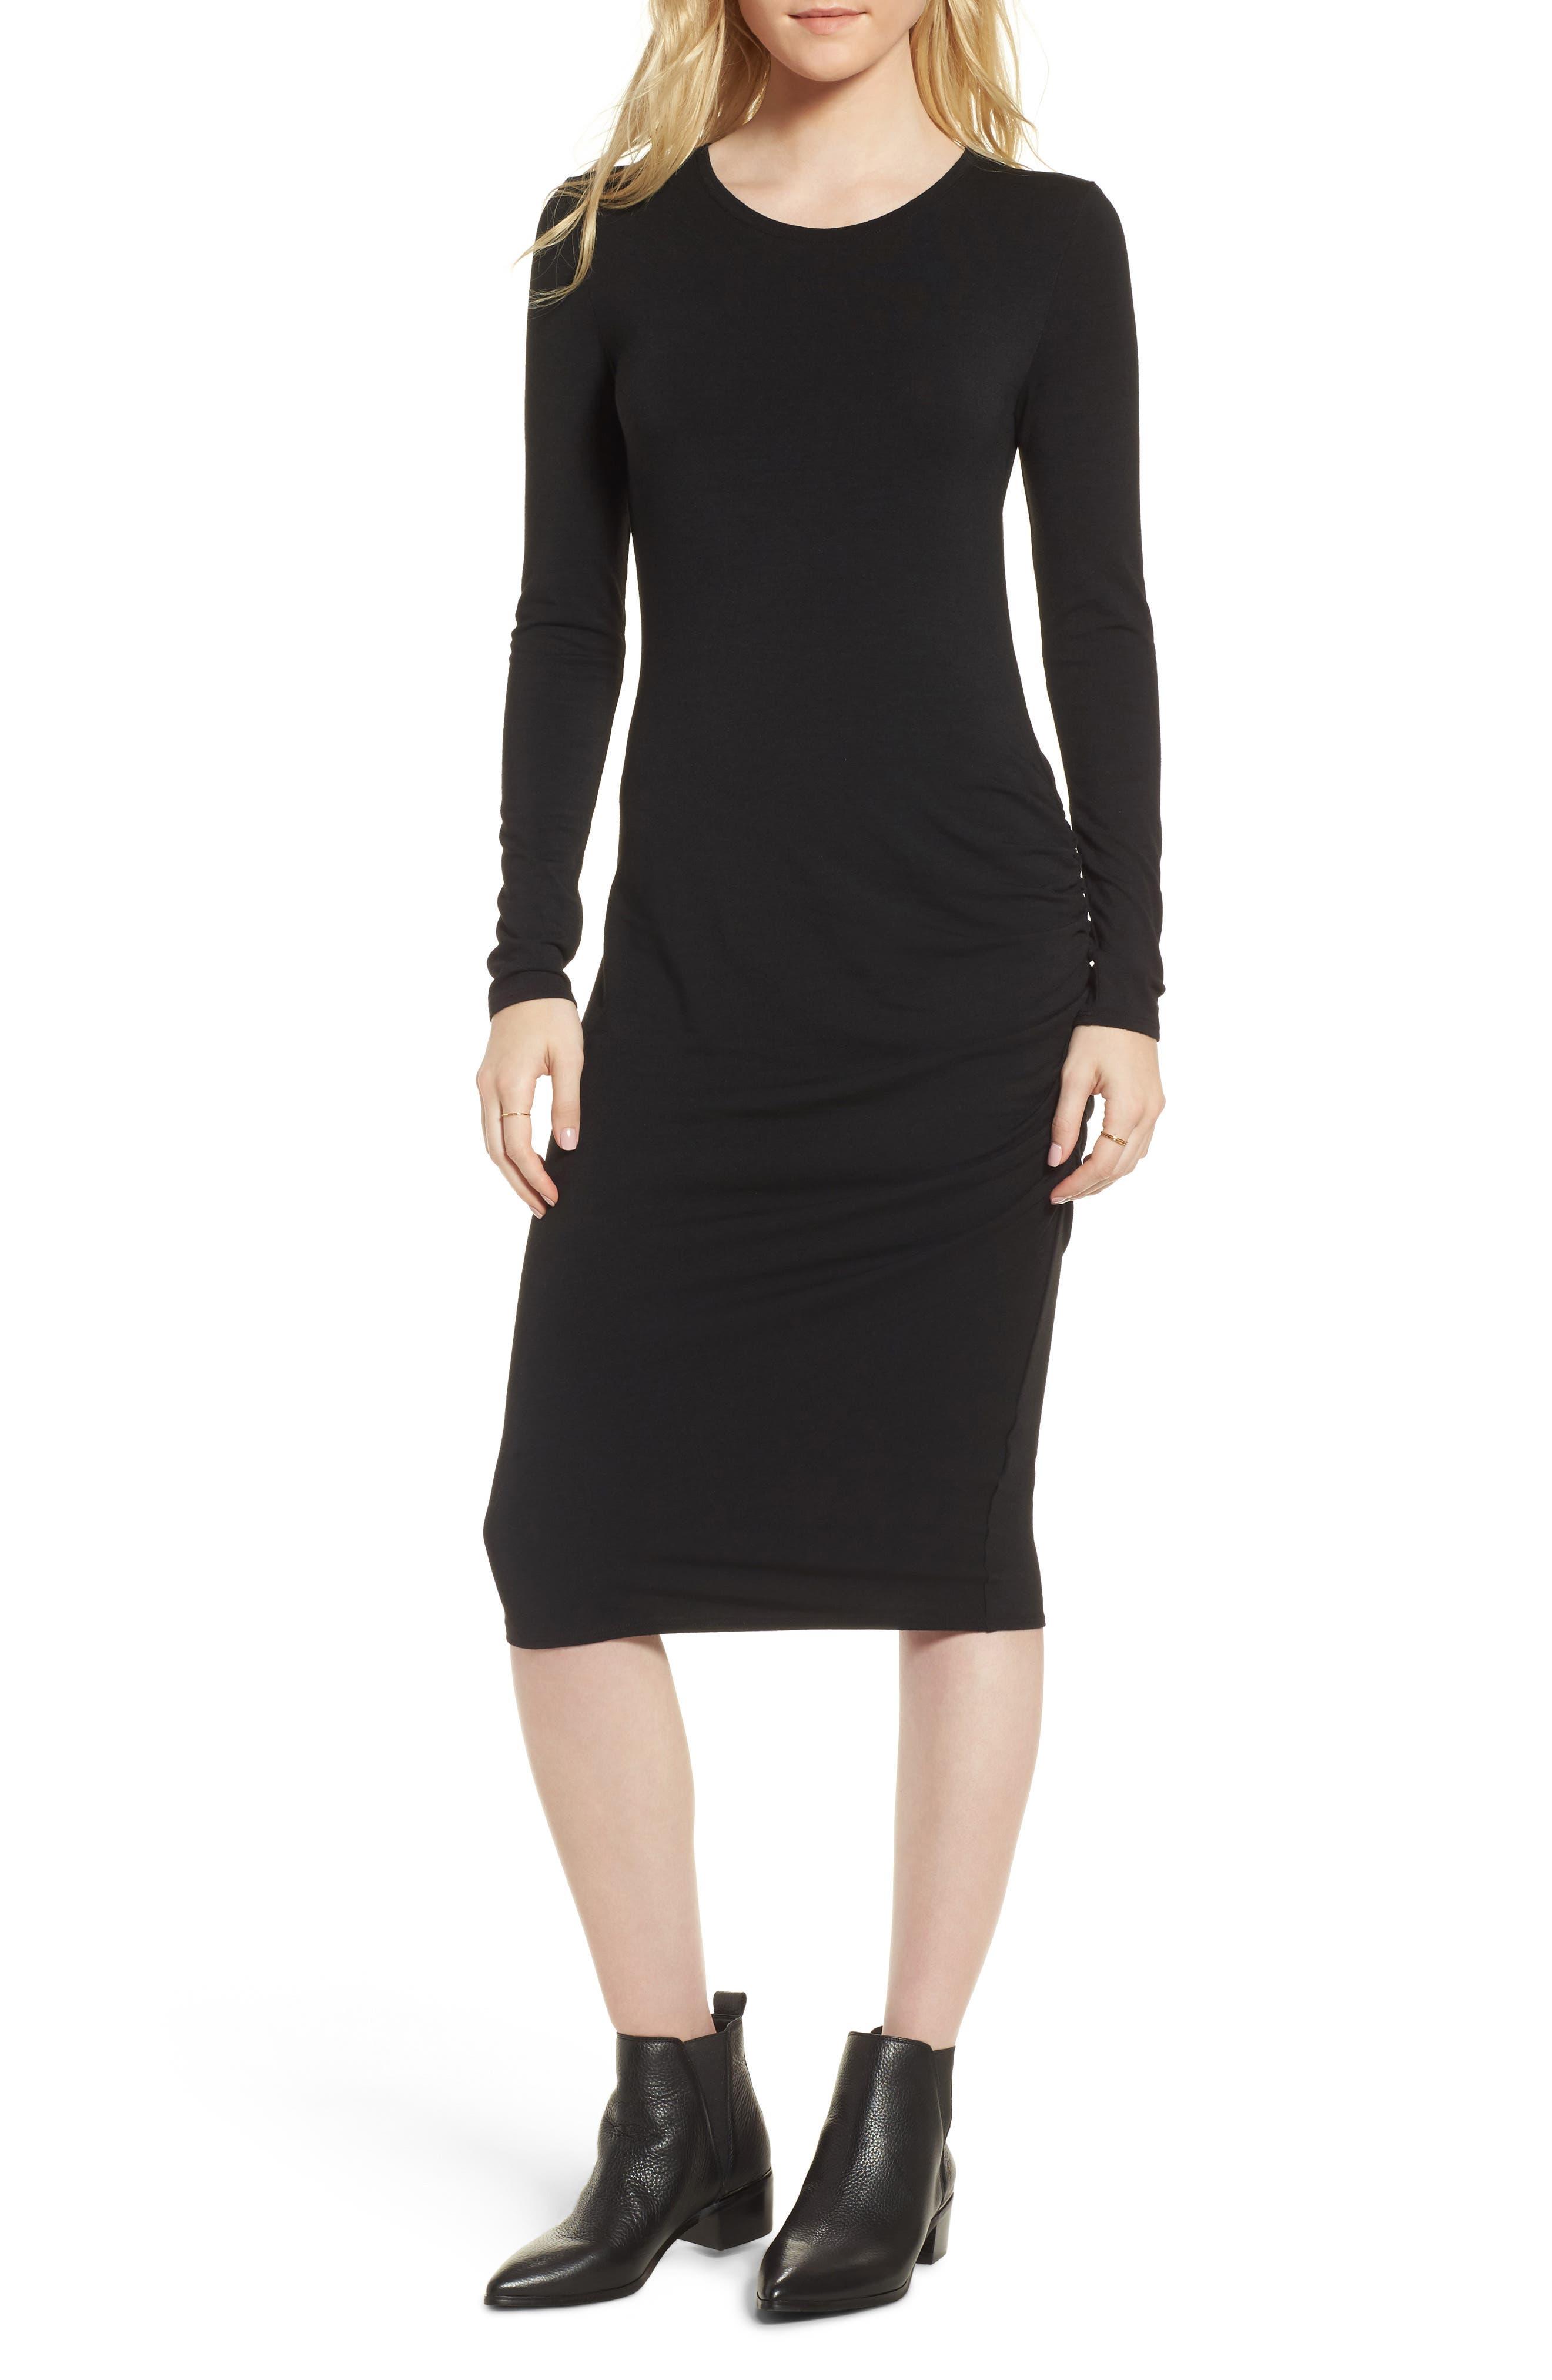 Alternate Image 1 Selected - Treasure & Bond Side Ruched Knit Sheath Dress